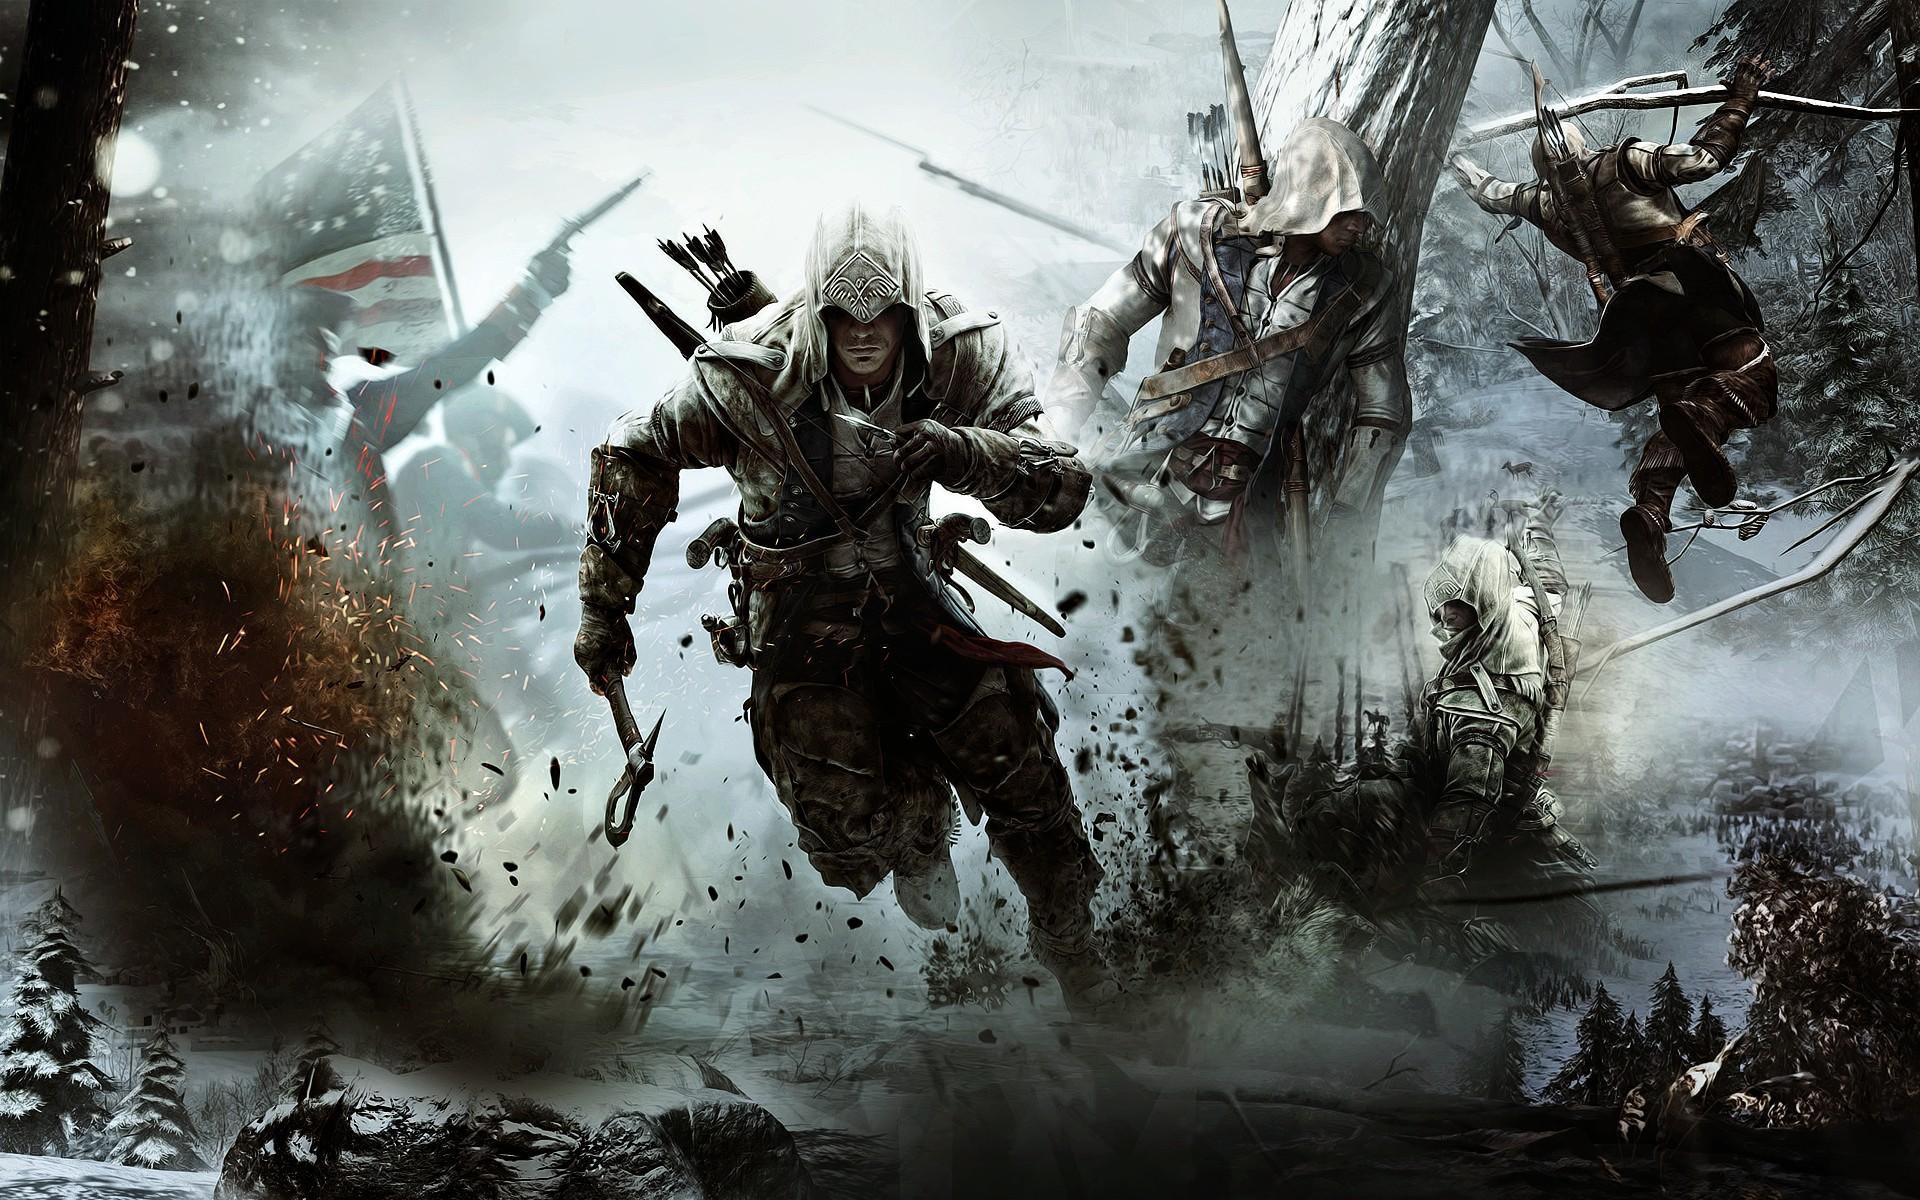 WallpaperPapel de parede de Assassins Creed III da Ubisoft 1920x1200